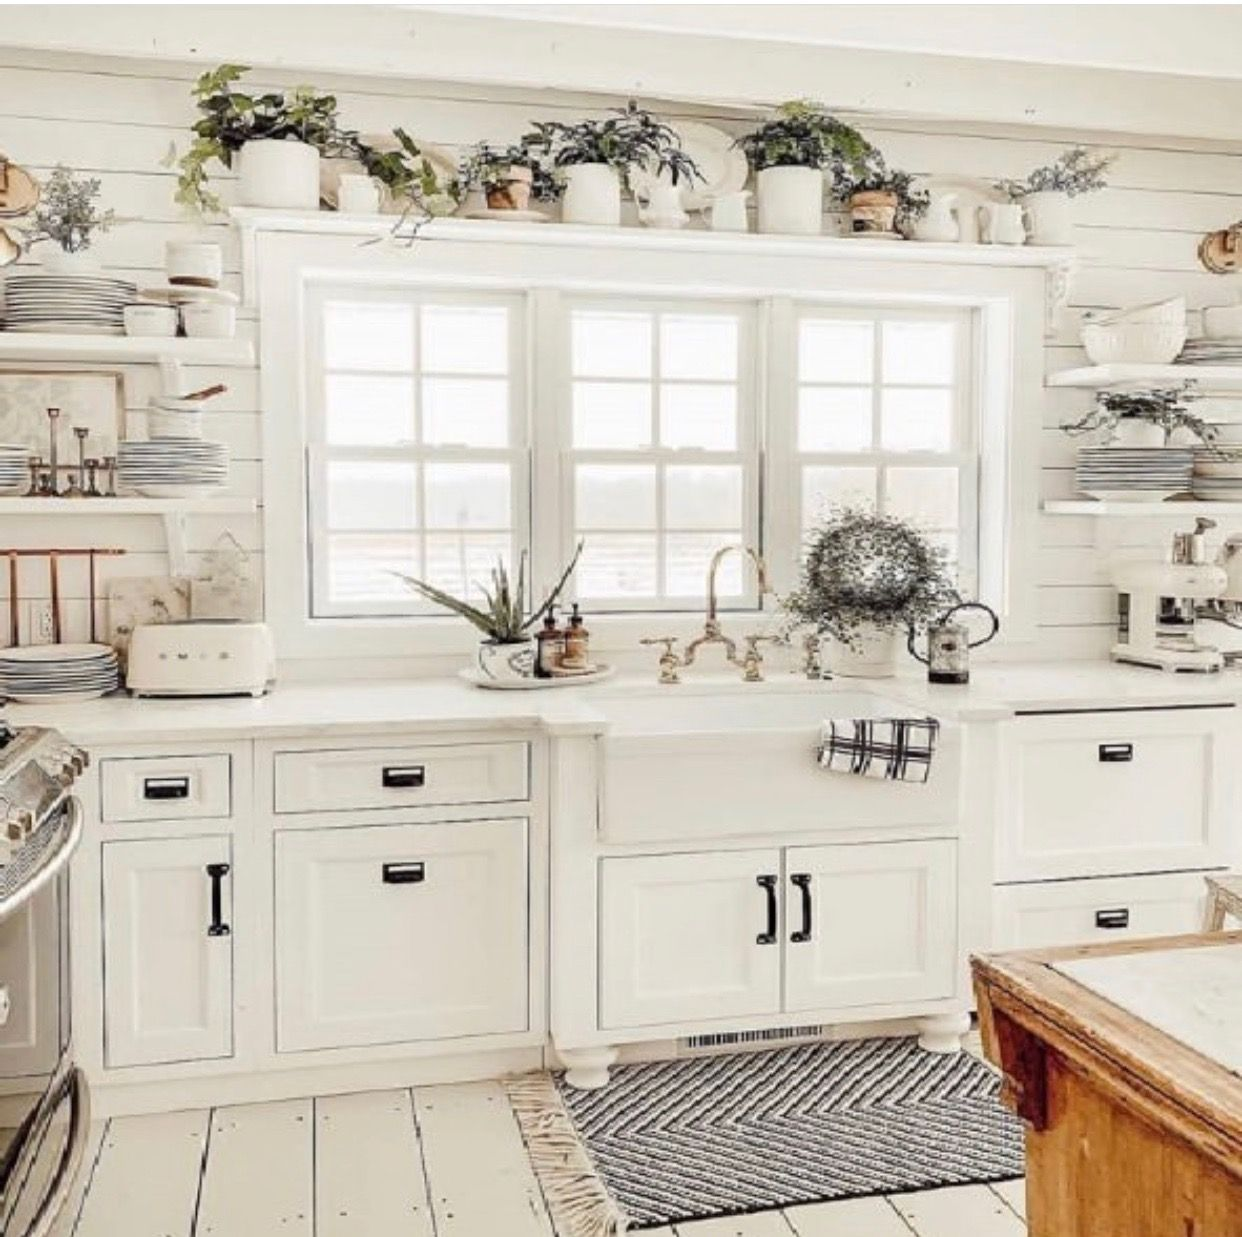 White farmhouse kitchens image by Irma Rodriguez on ...